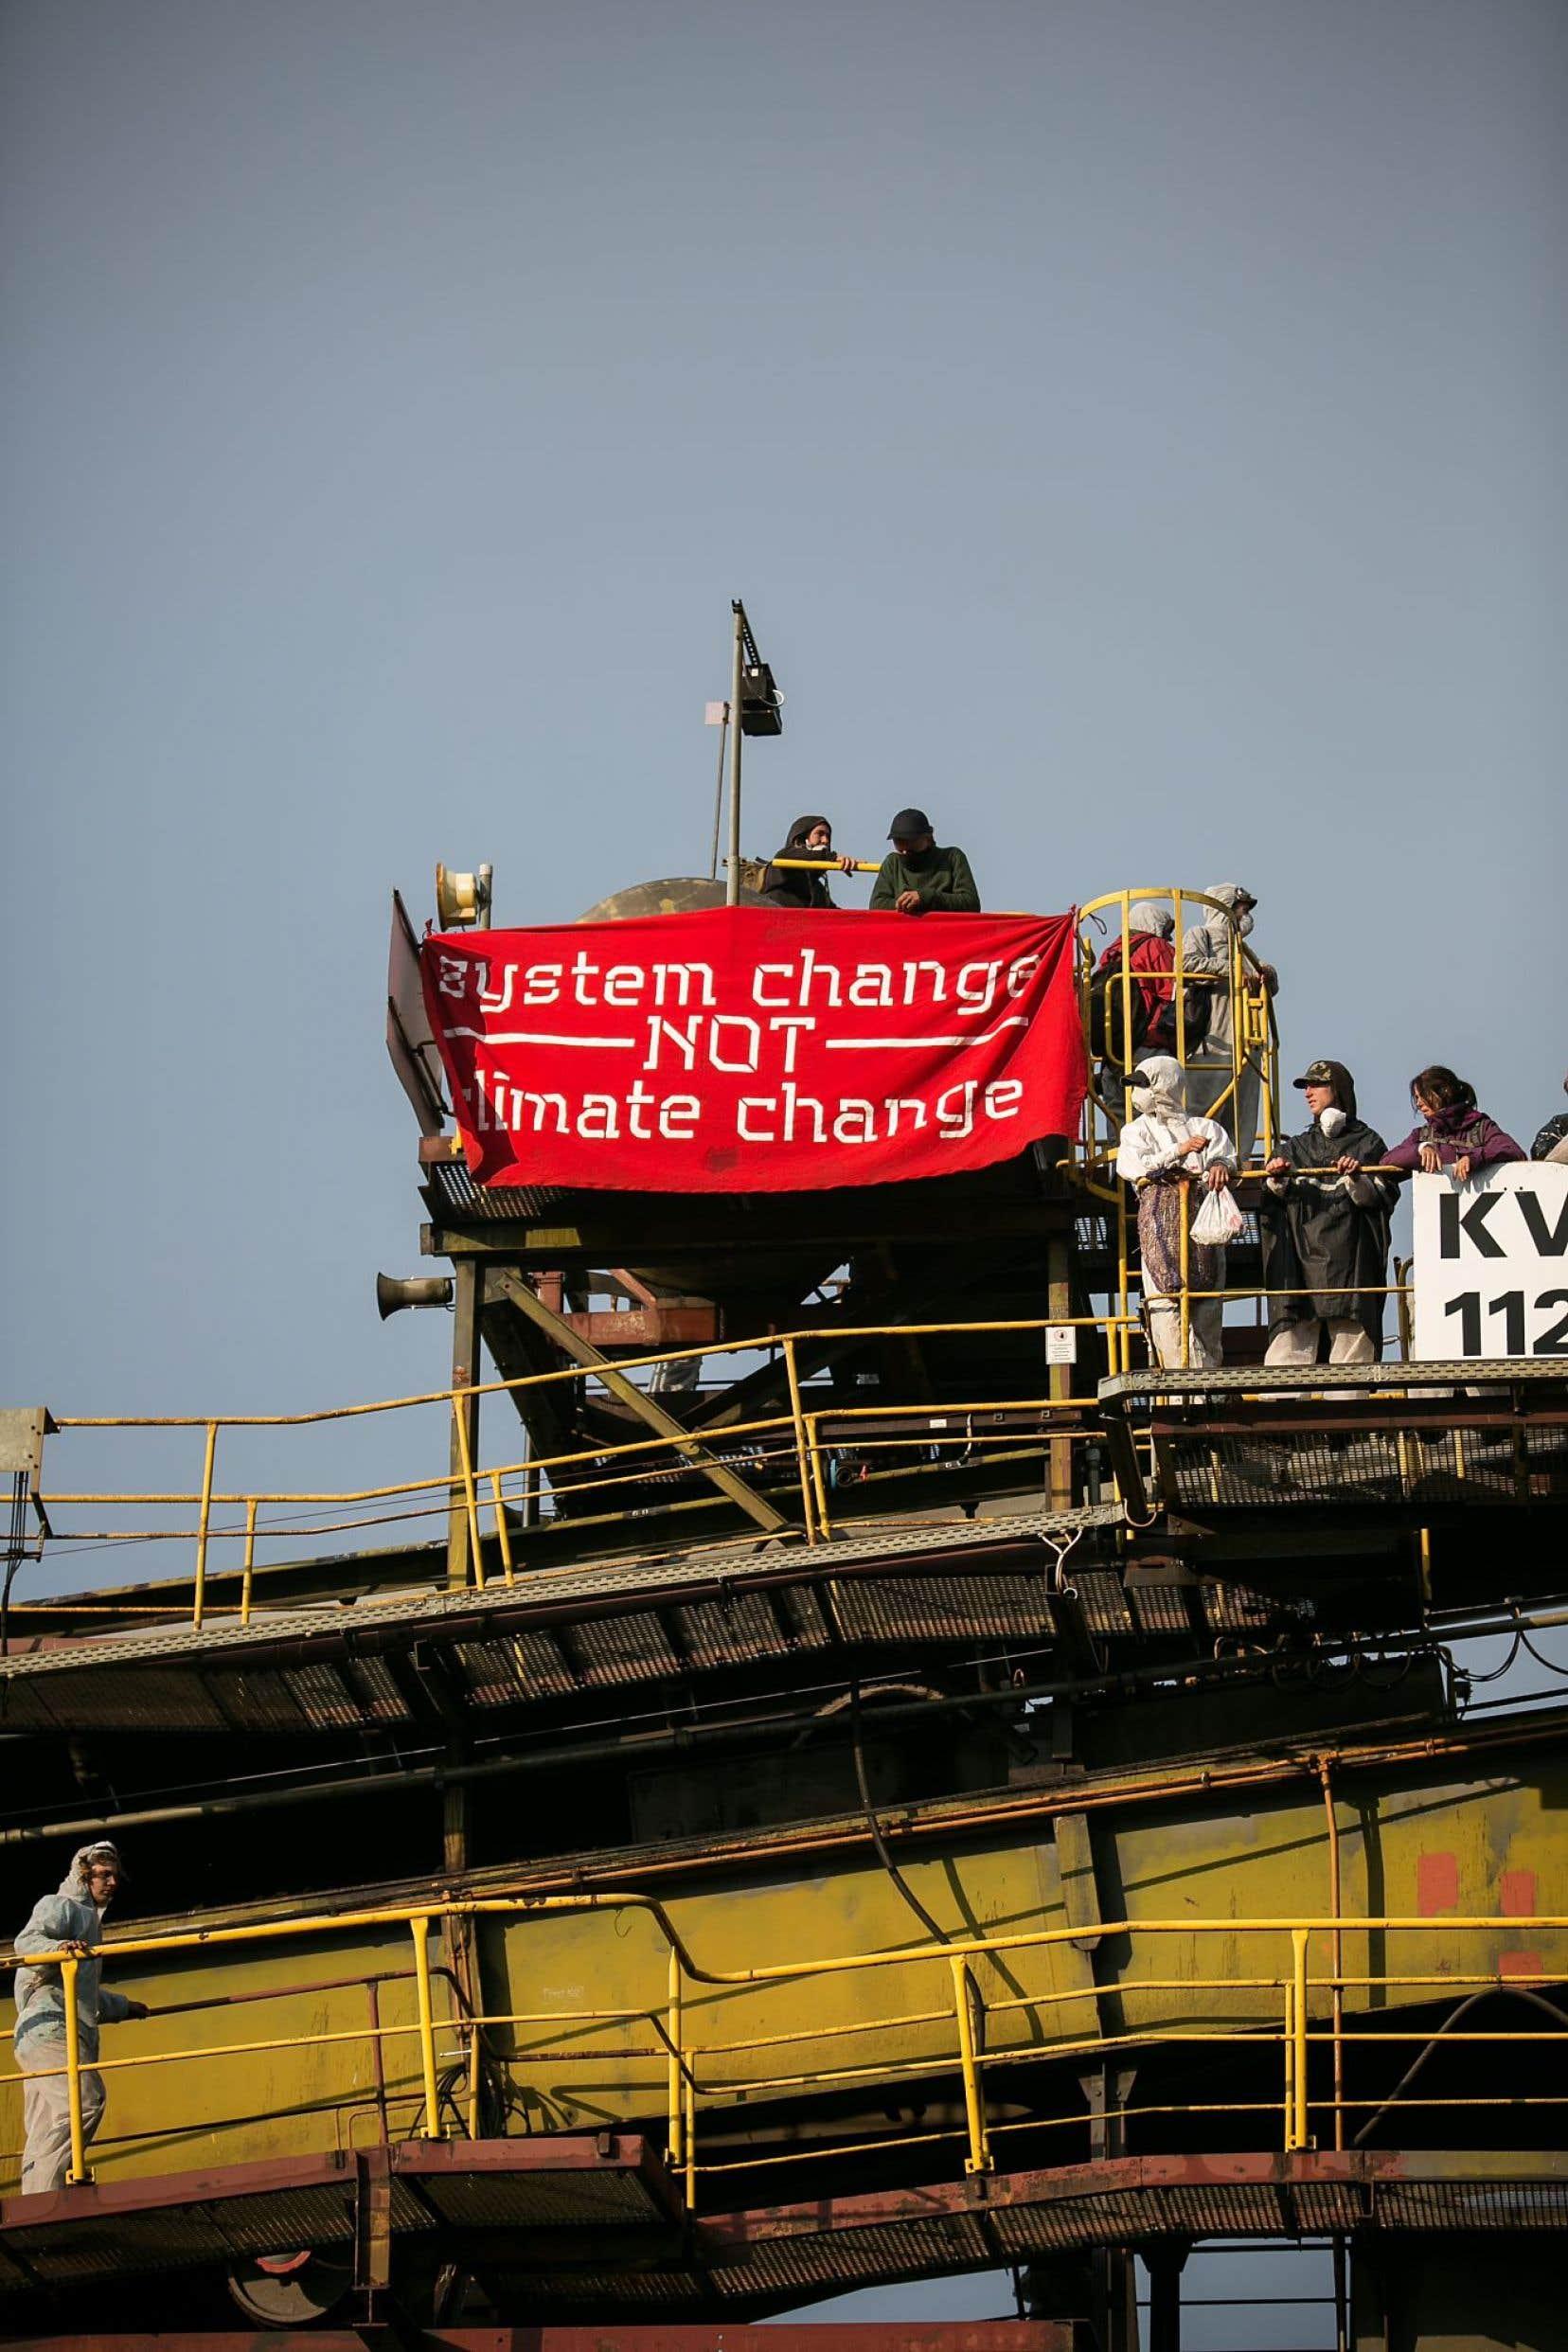 Des militants d'Ende Gelände en pleine action, vendredi dernier